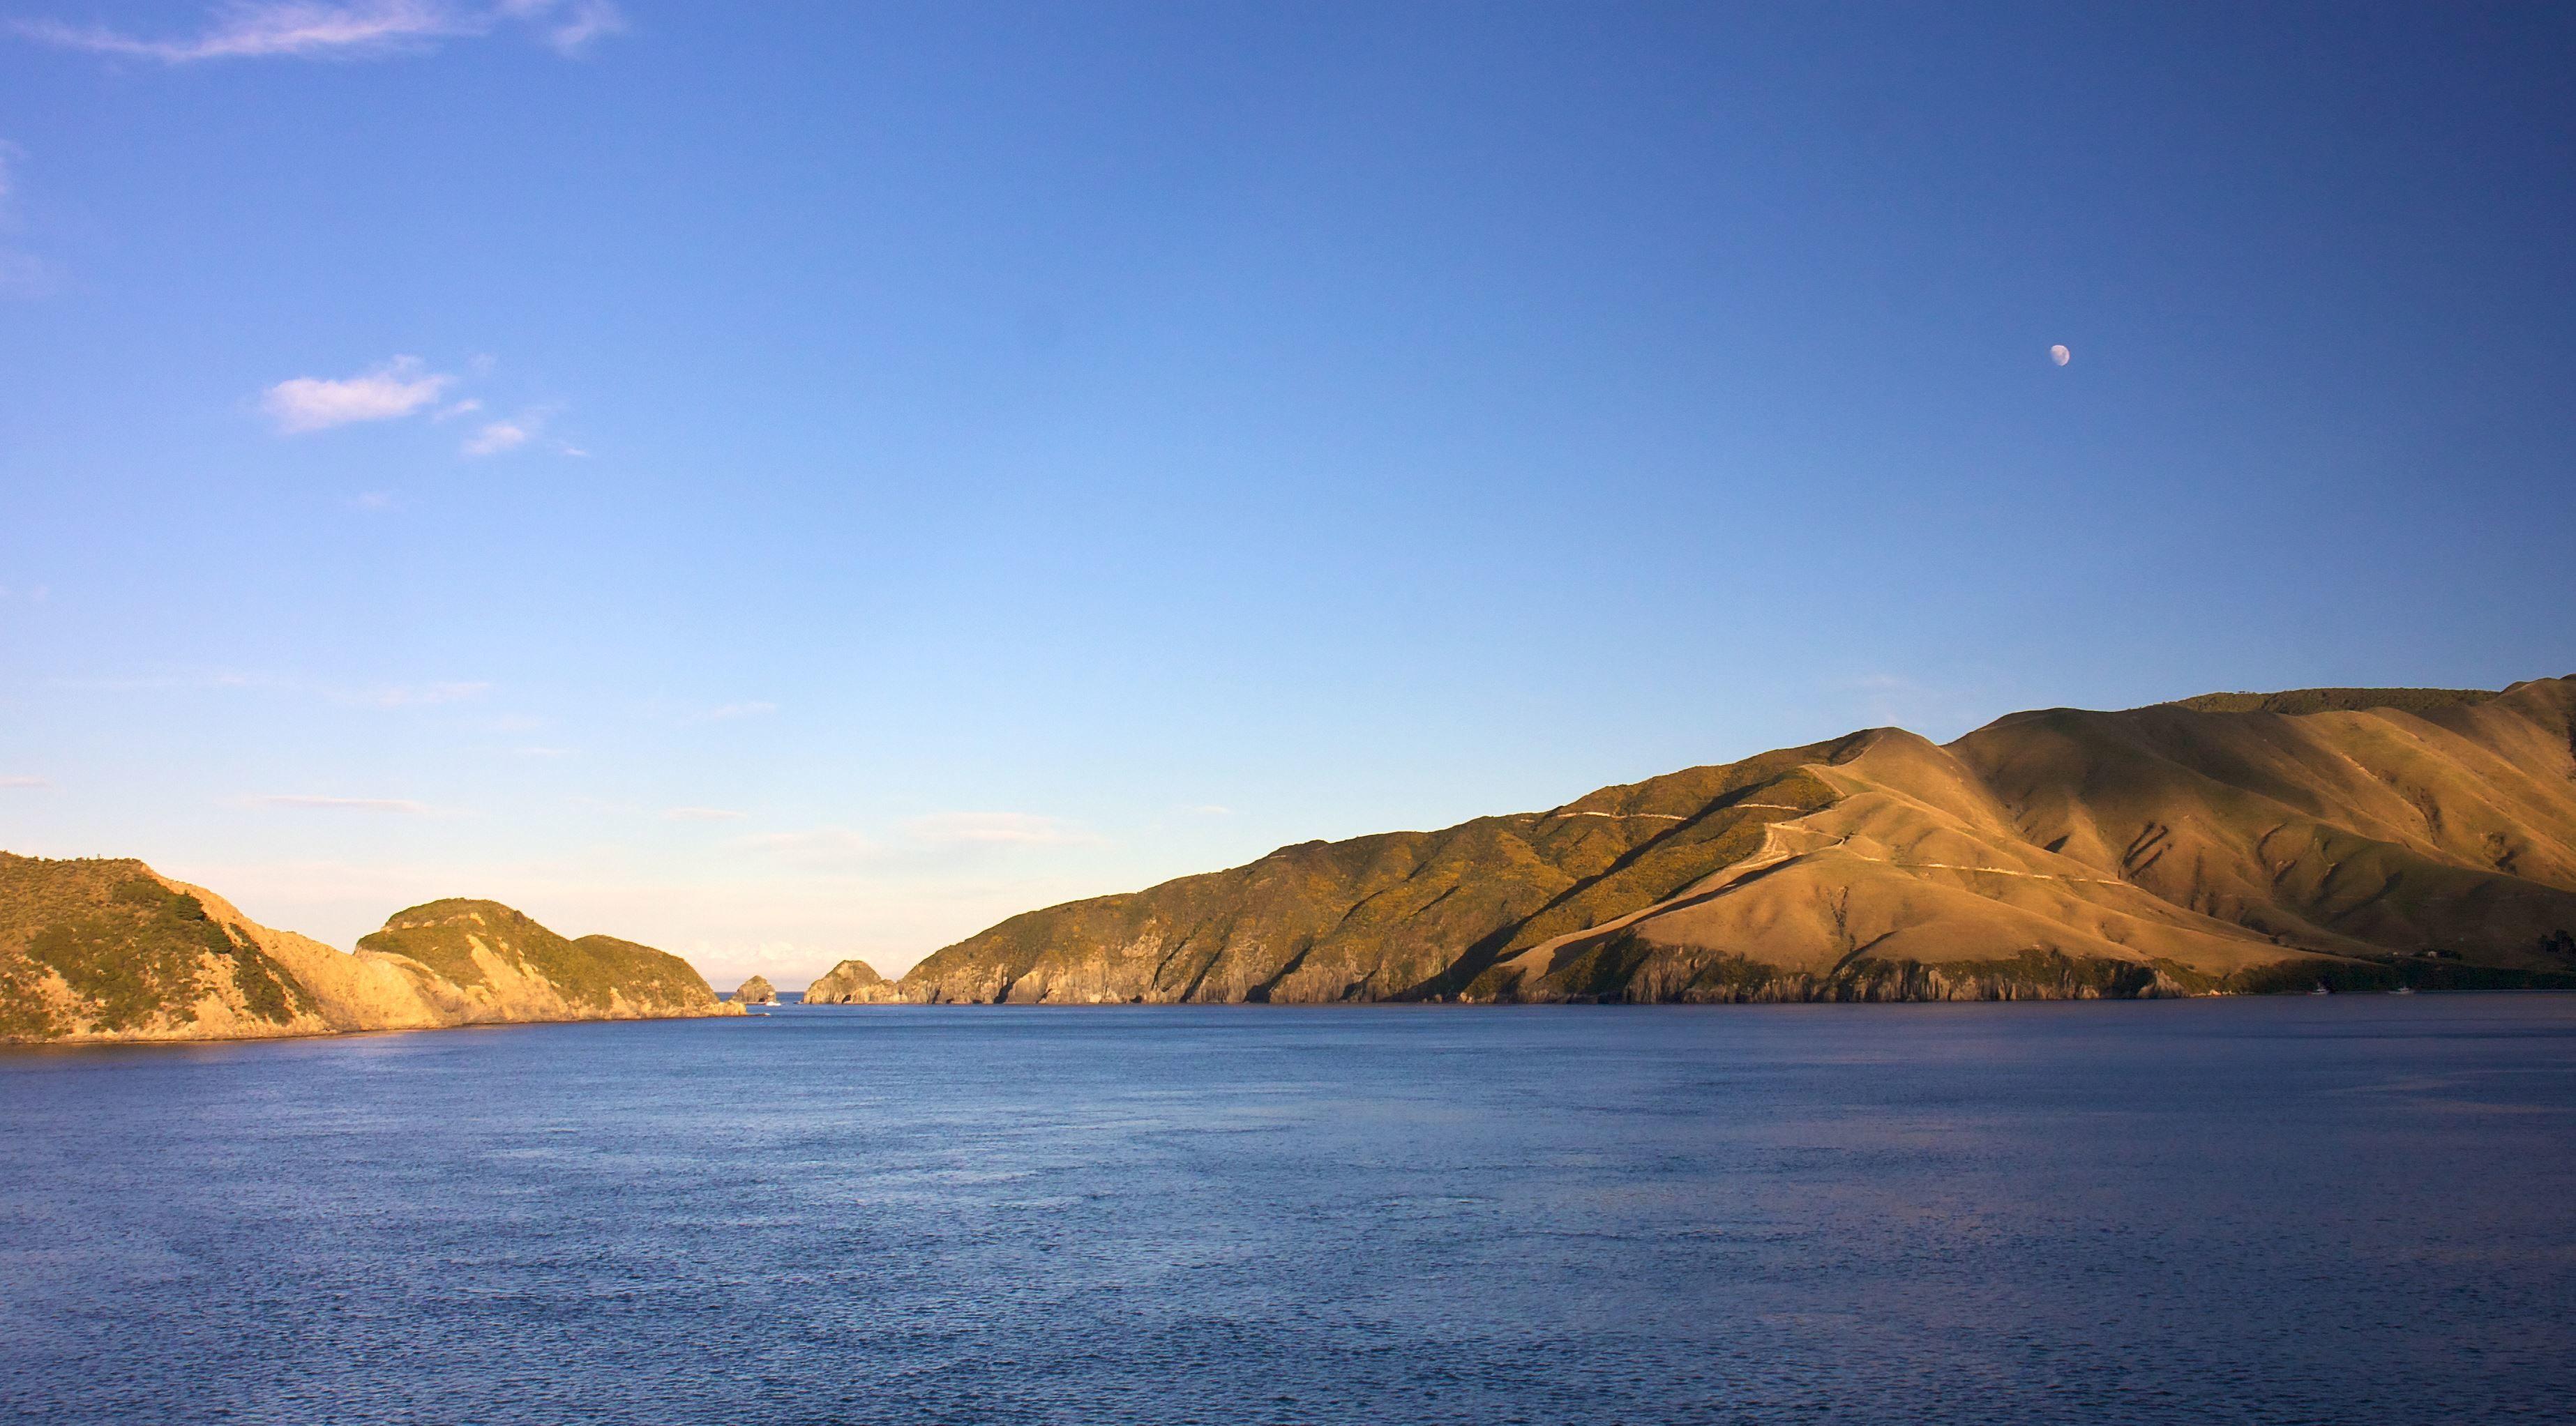 Imagen gratis: tierra, cielo, agua, lago, montañas, Costa